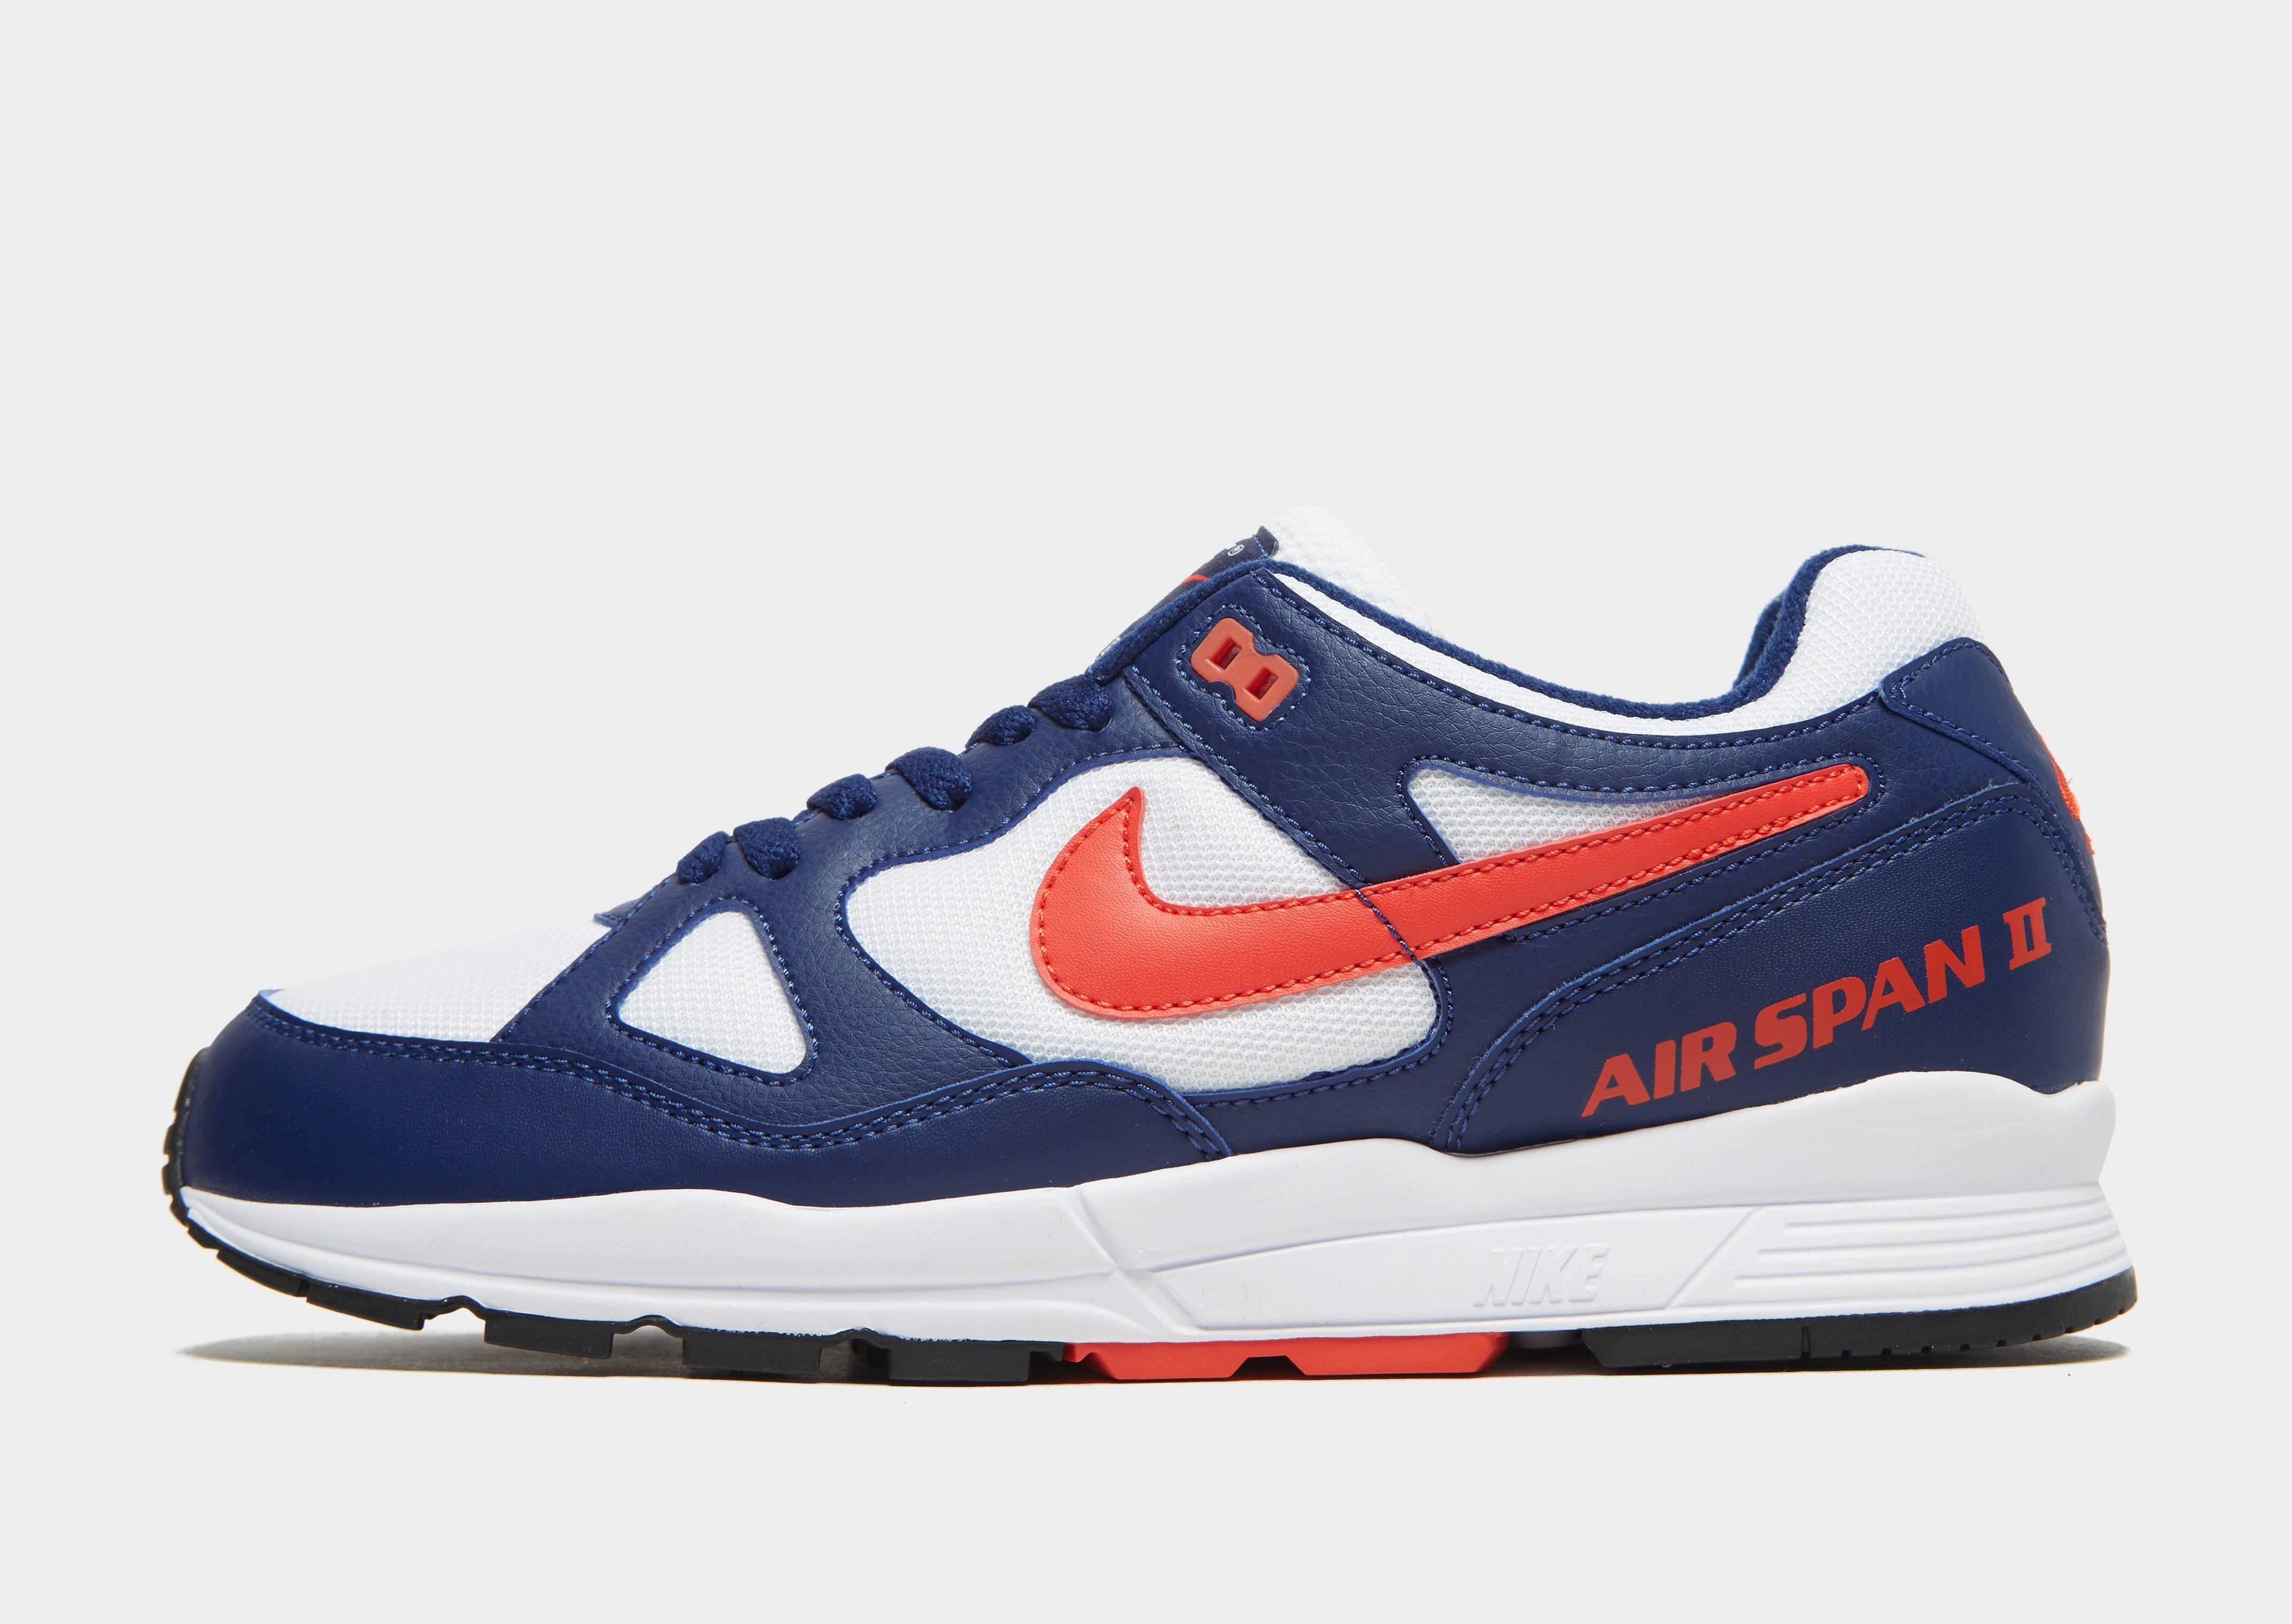 b17a27395 Nike Air Span II